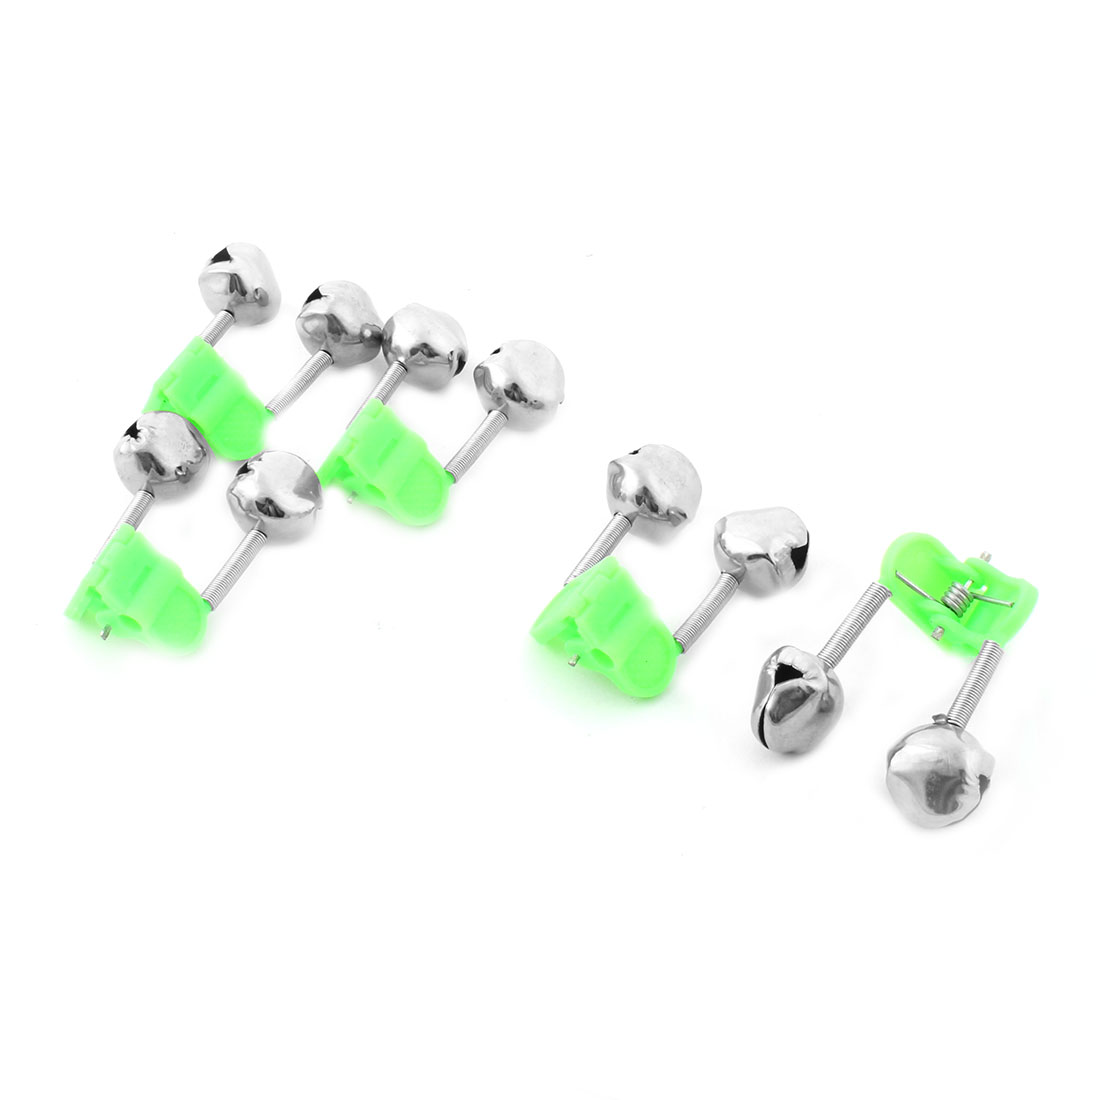 5 Pcs Green Plastic Clip Metal Dual Spring Rod Bell Alert Fishing Alarm